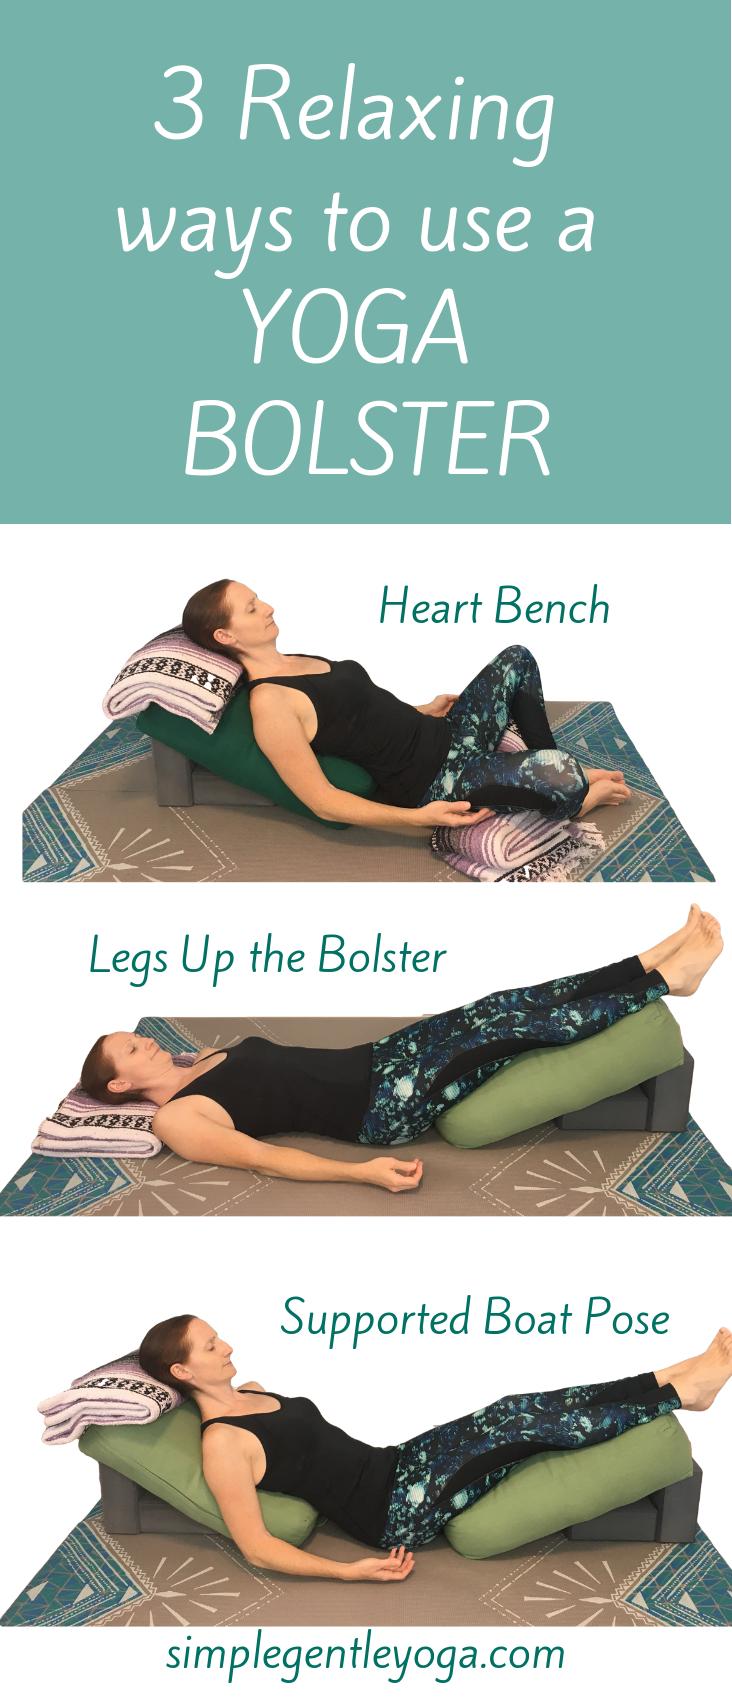 47 Restorative Yoga Poses with a Bolster  Restorative yoga poses